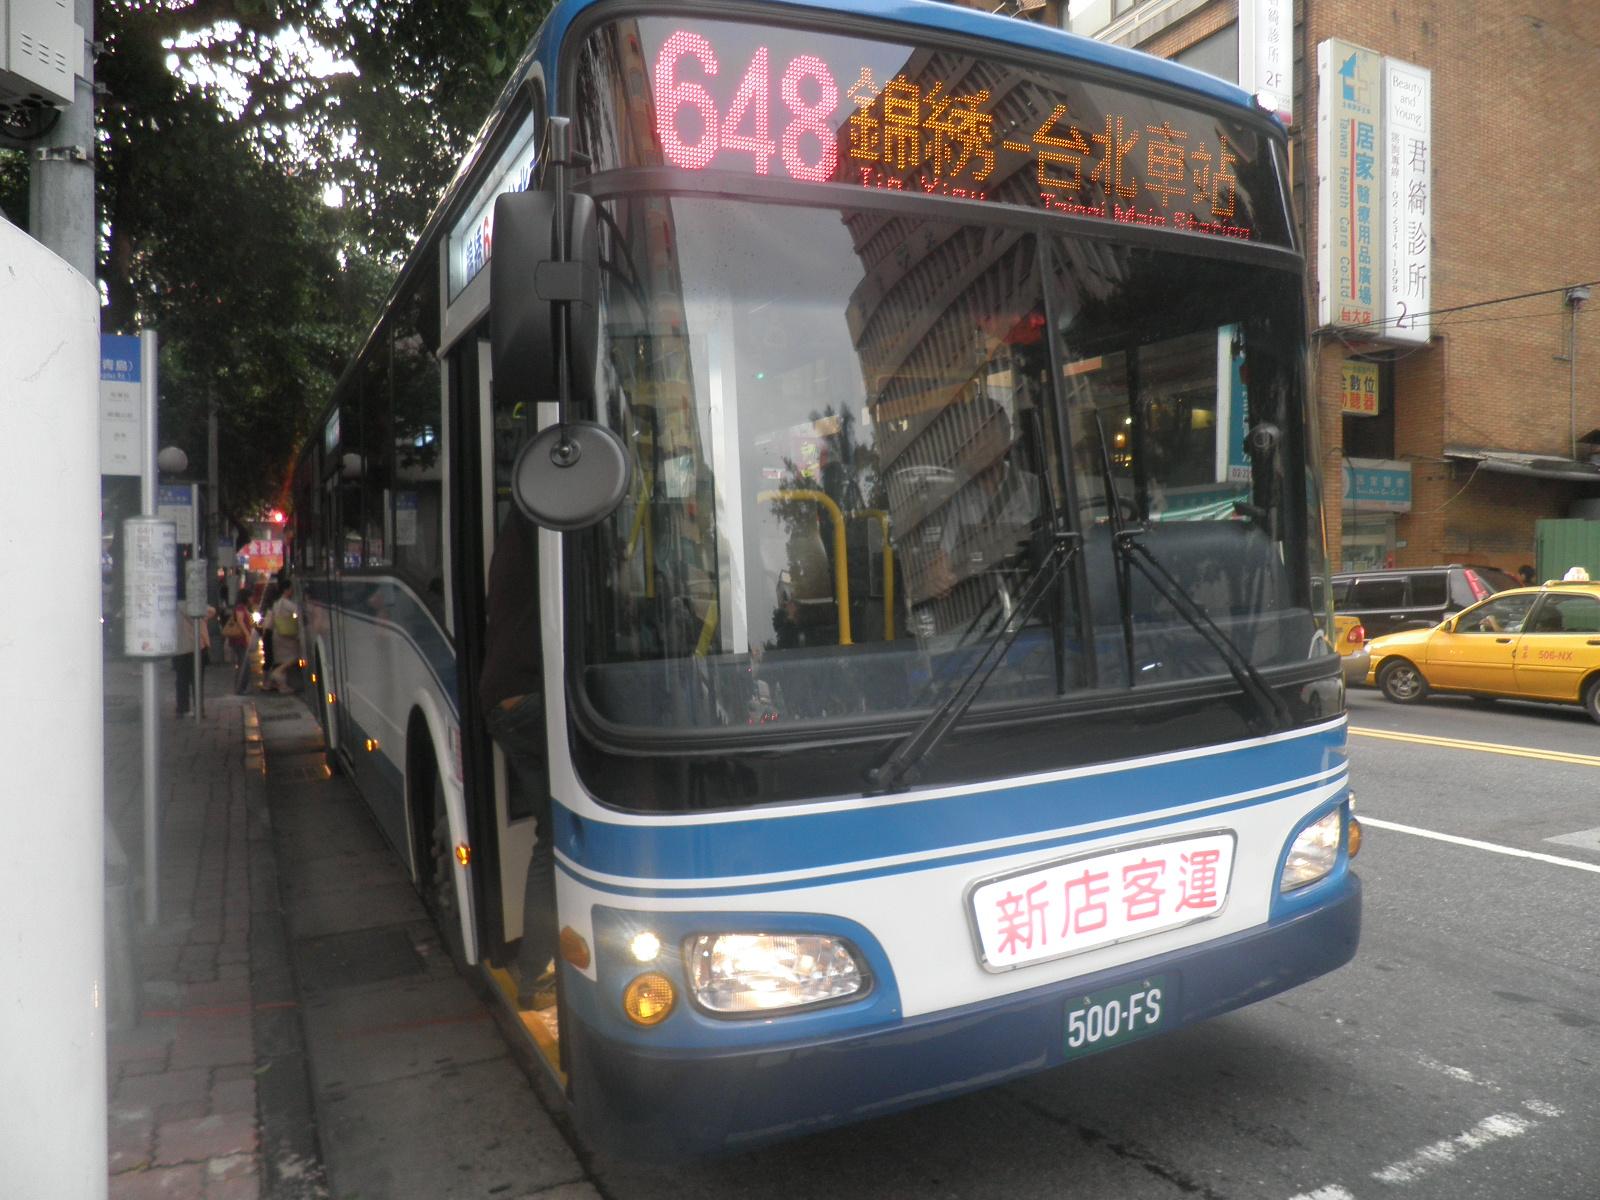 File:新店客運500FS 648.JPG